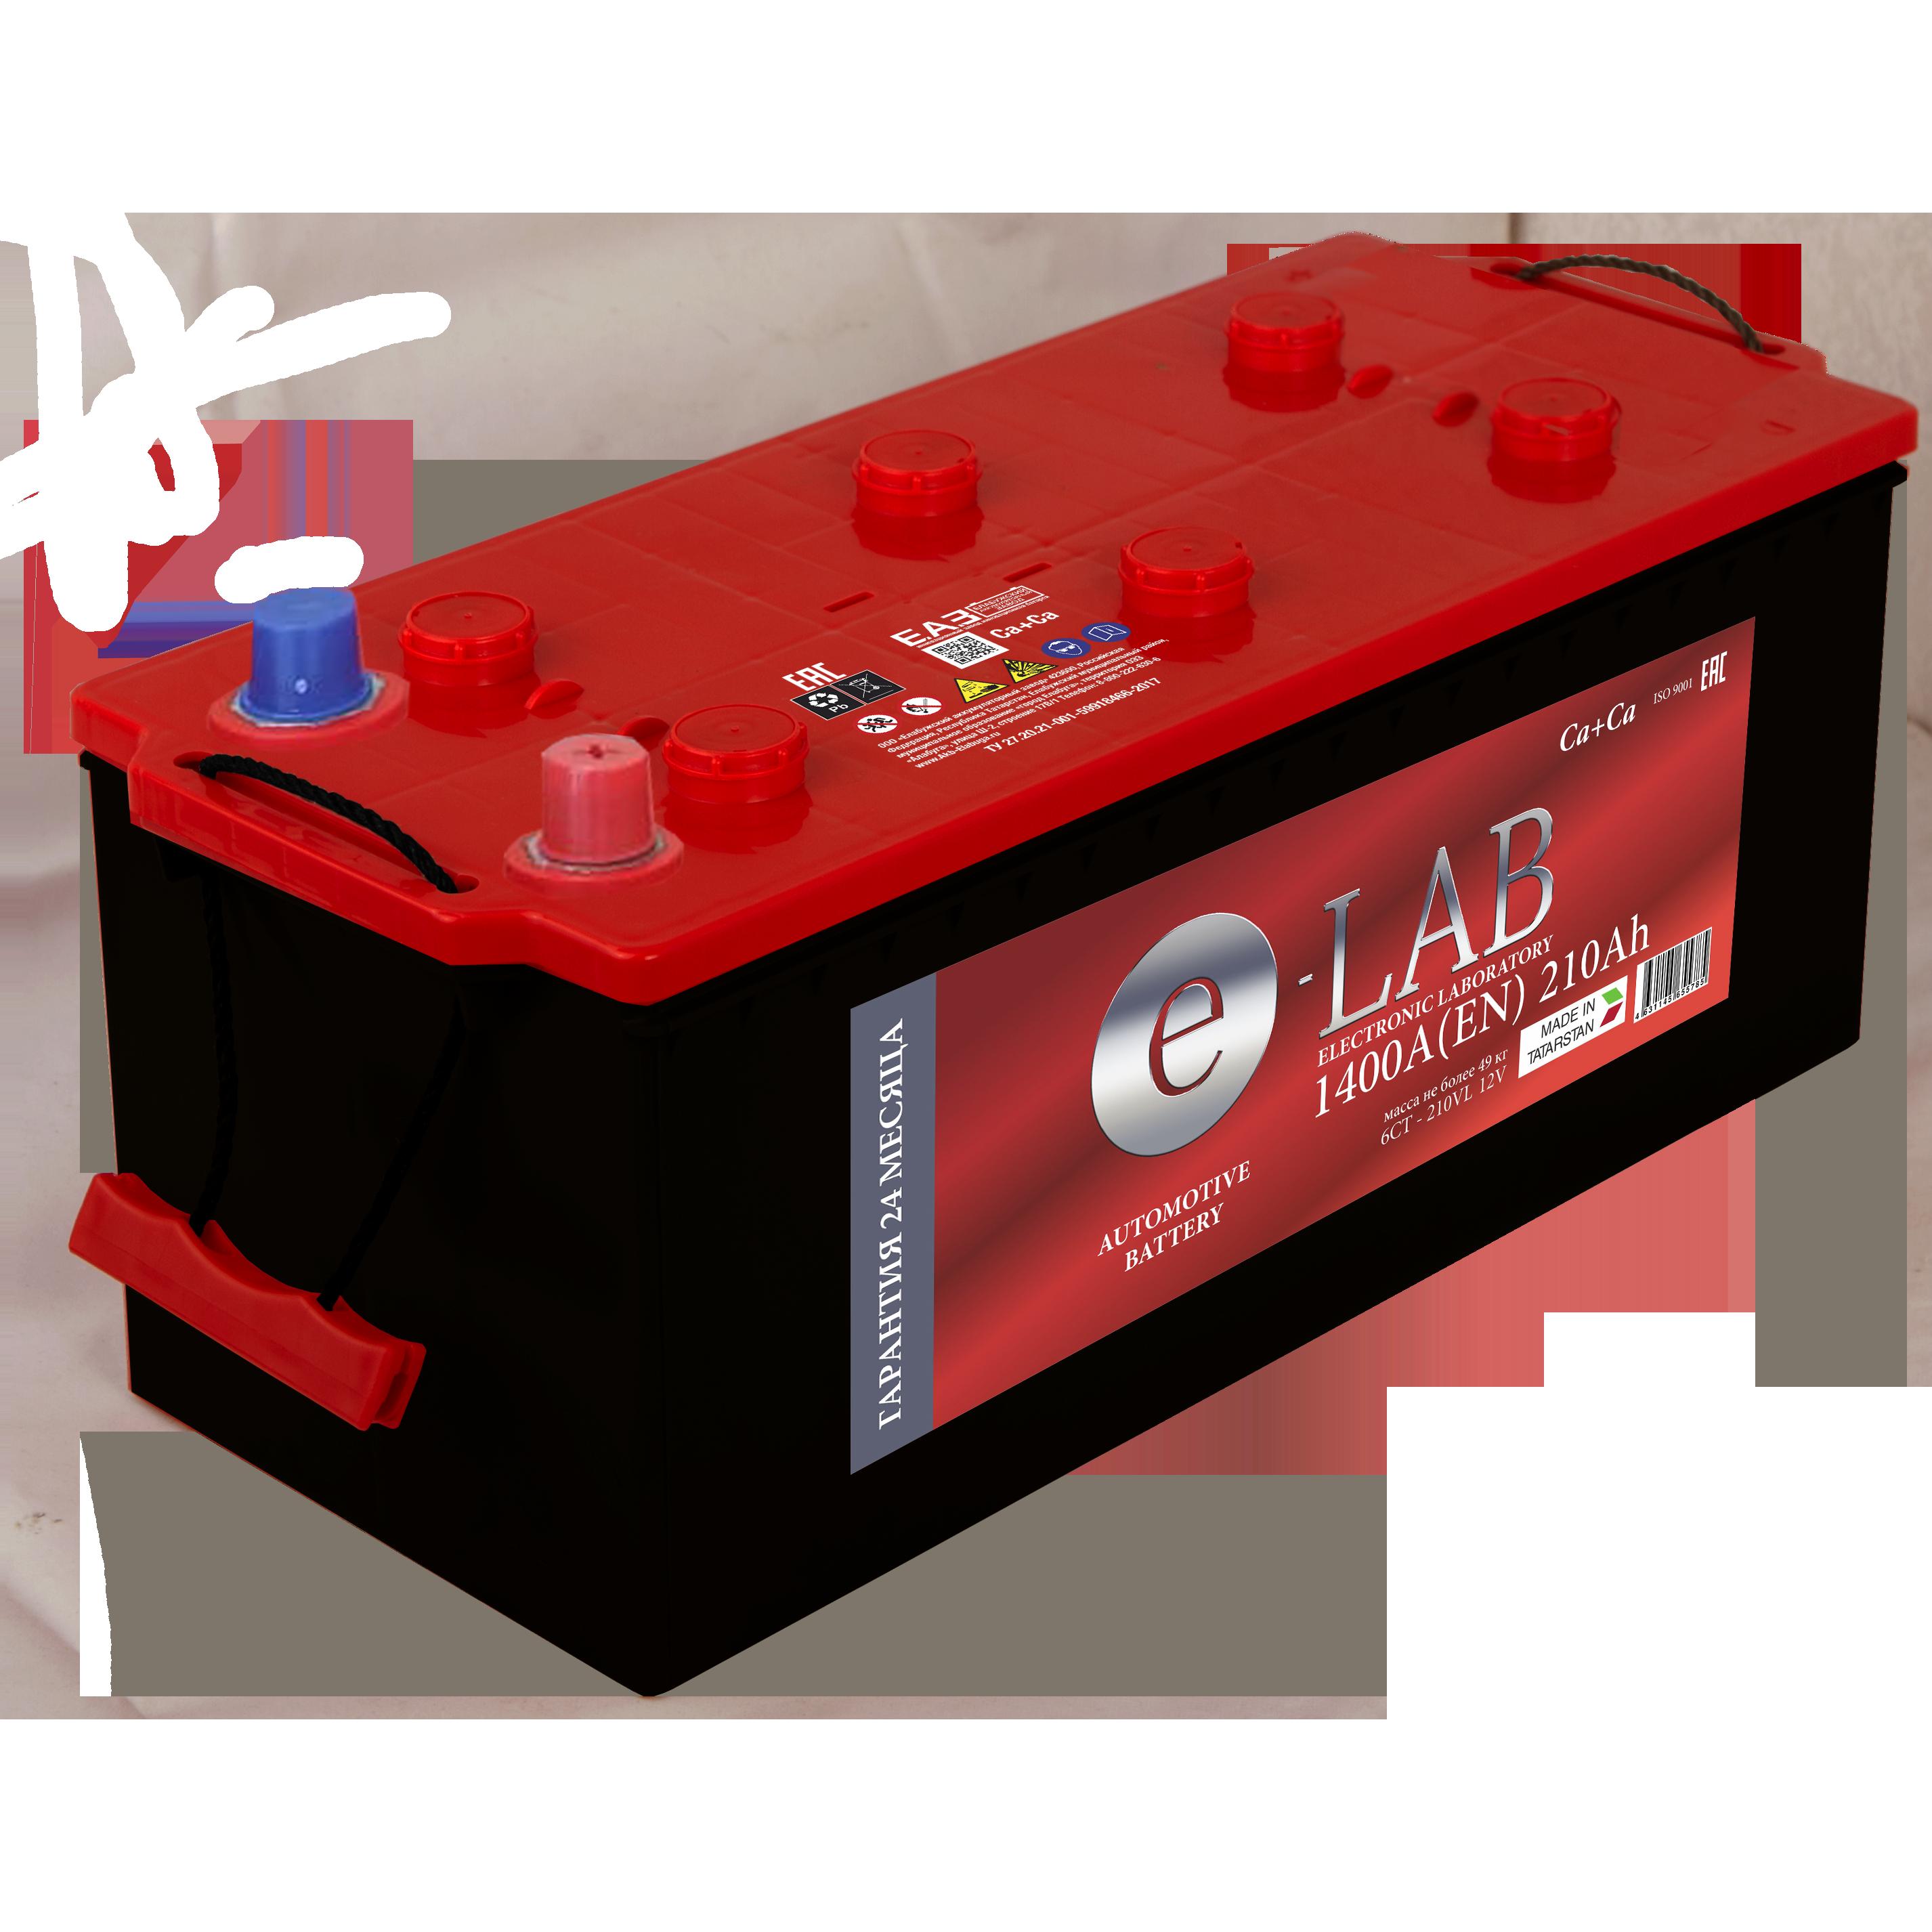 АКБ 6СТ- 210 «E-LAB» п.п.